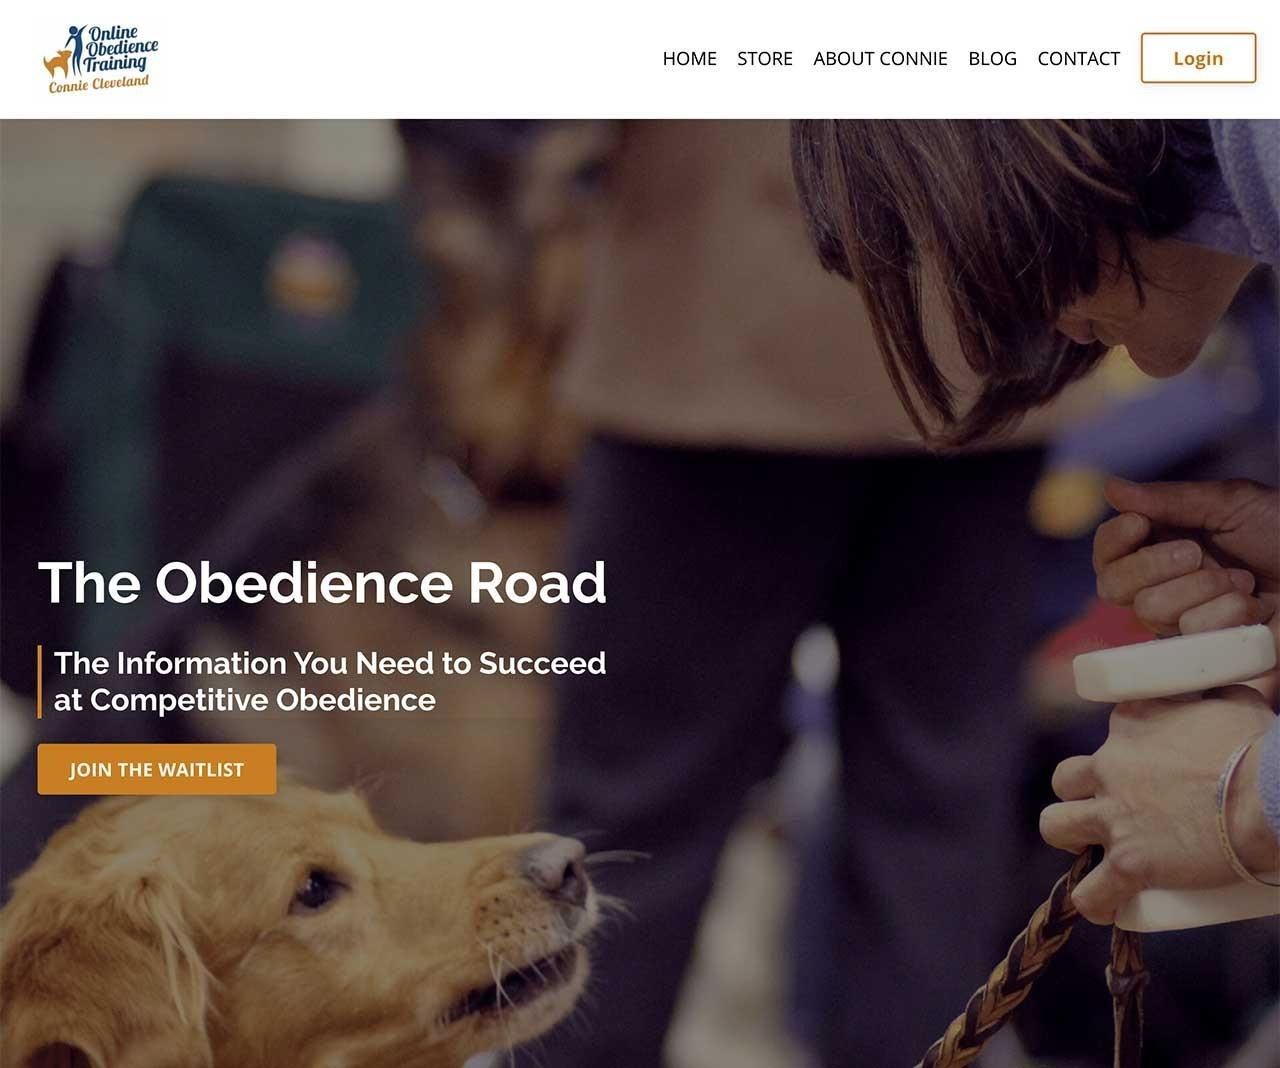 Obedience Road is built on the Kajabi Platform